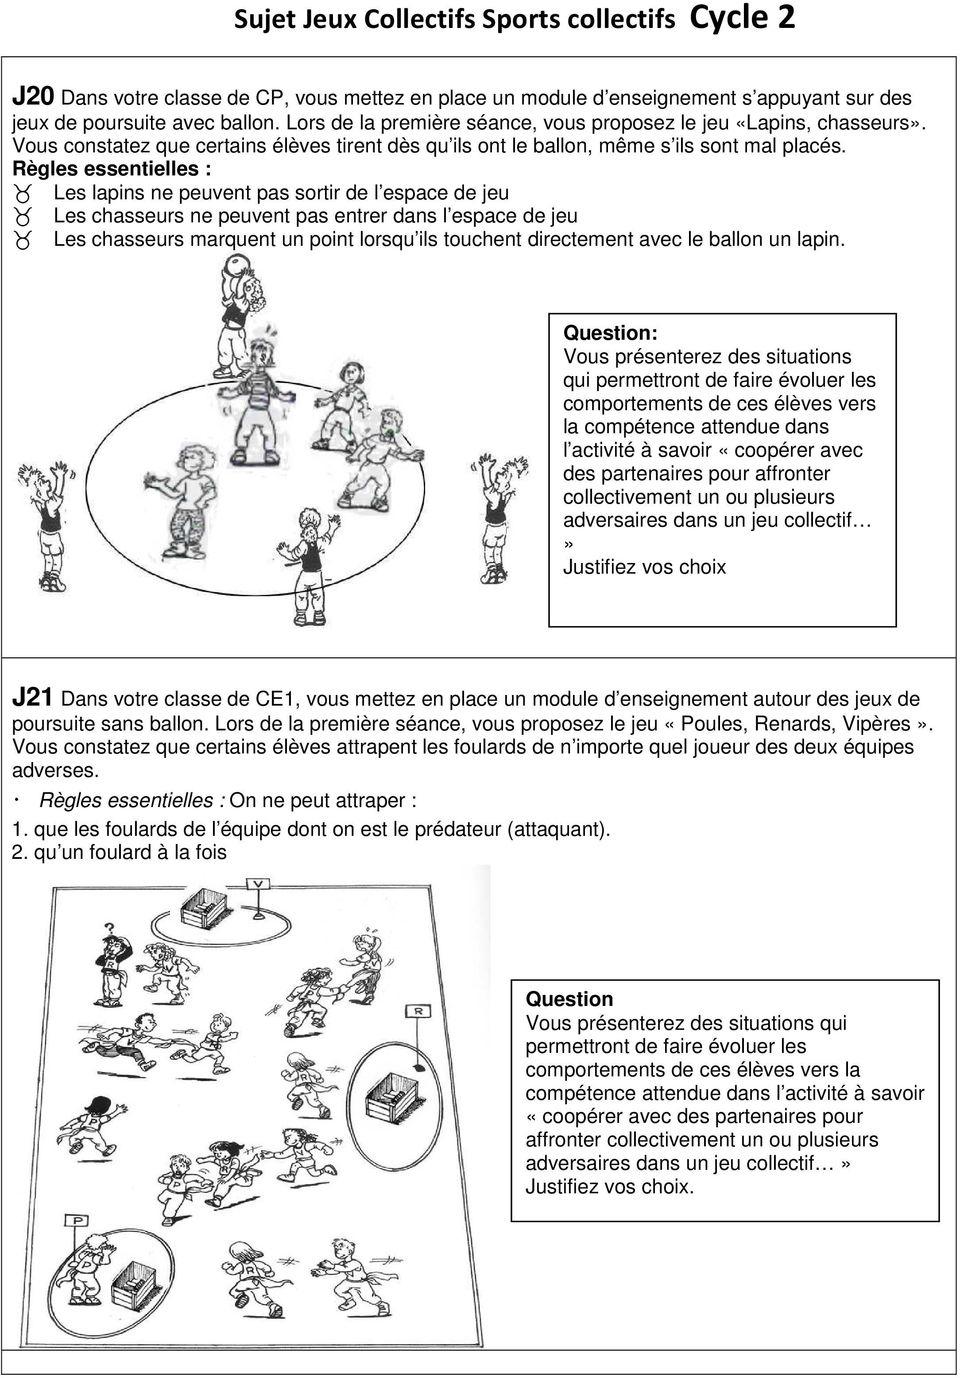 Sujet Jeux Collectifs Sports Collectifs Cycle 1 - Pdf Free serapportantà Jeux Collectifs Cycle 3 Sans Ballon